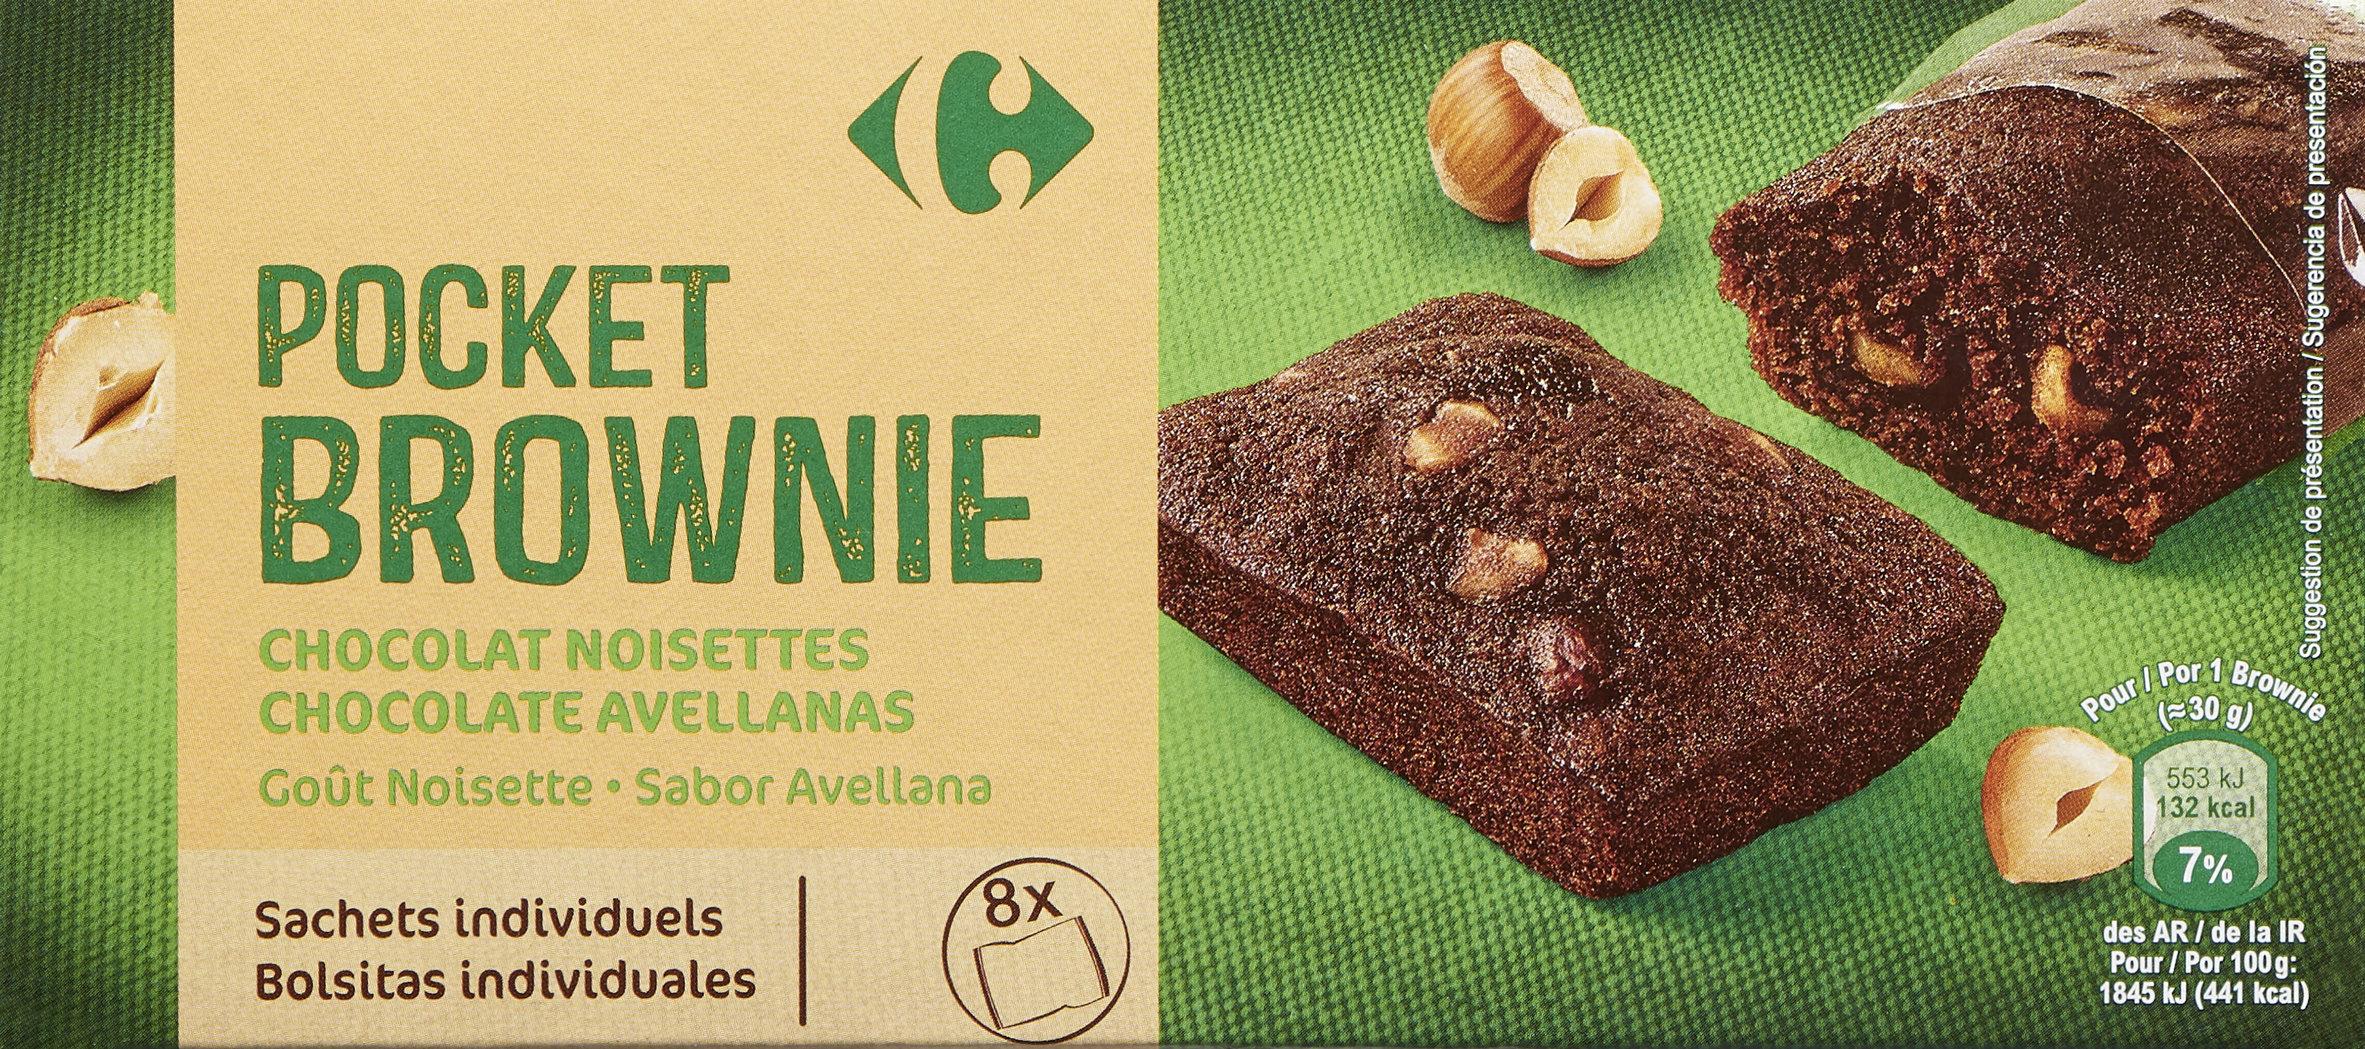 Brownie  chocolat noisettes goût noisette. - Product - fr